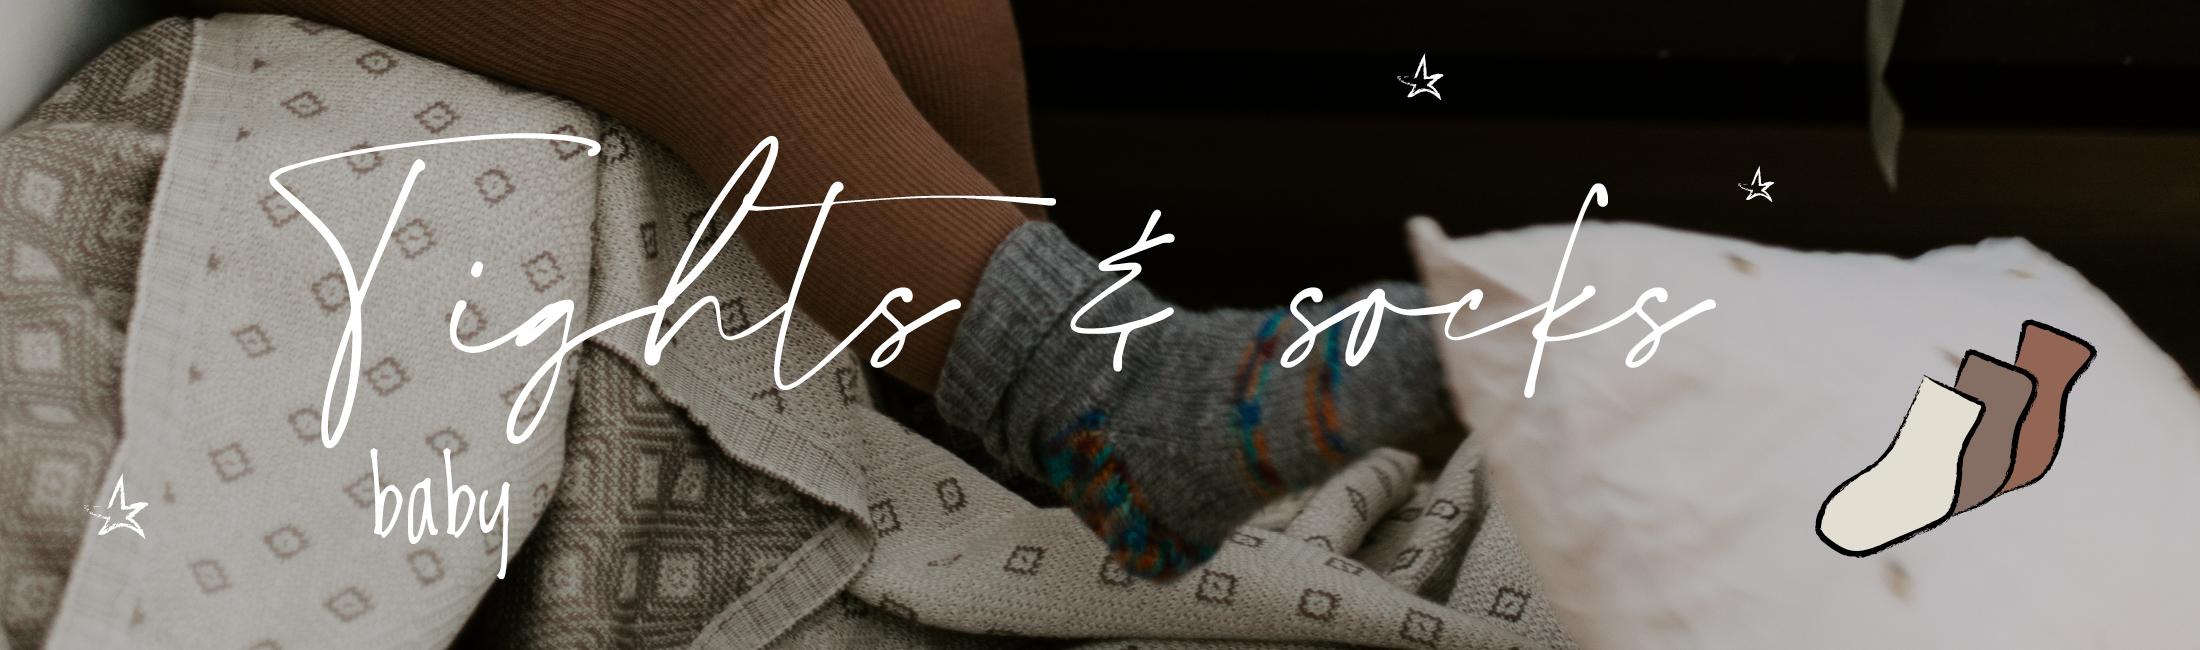 Baby - Tights & Socks